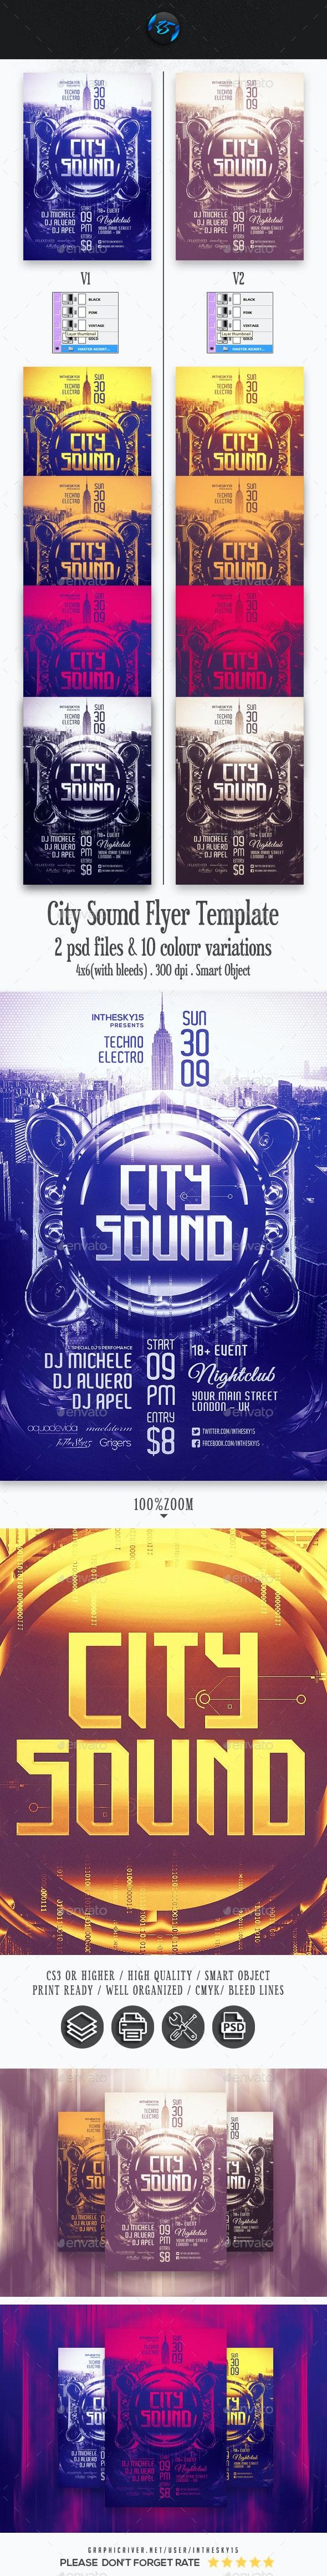 City Sound Flyer Template - Flyers Print Templates